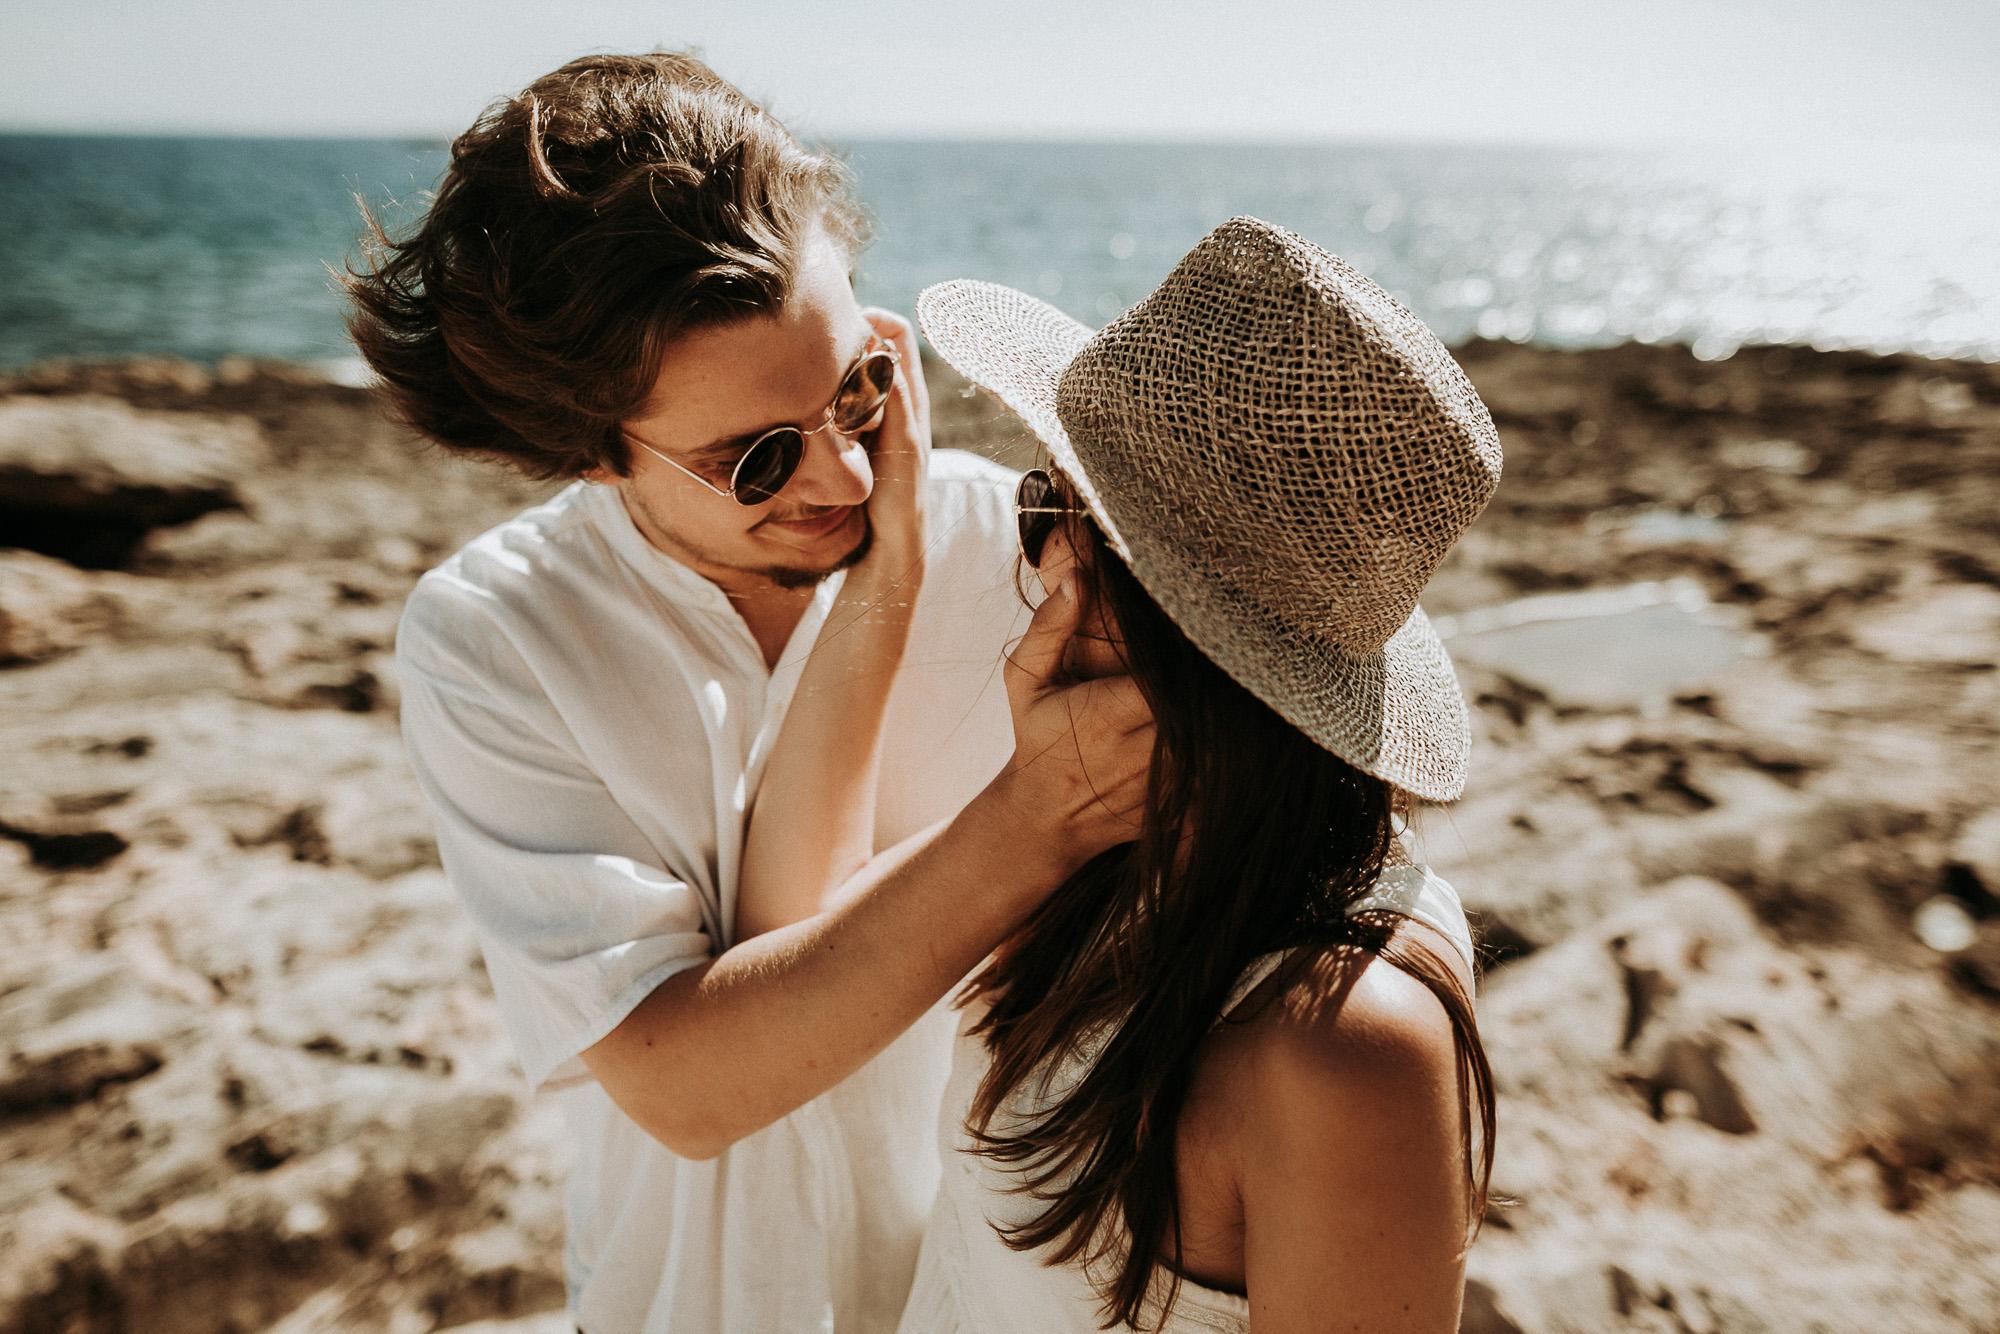 DanielaMarquardtPhotography_wedding_elopement_mallorca_spain_stjordi_sessalines_marinaandxavi366